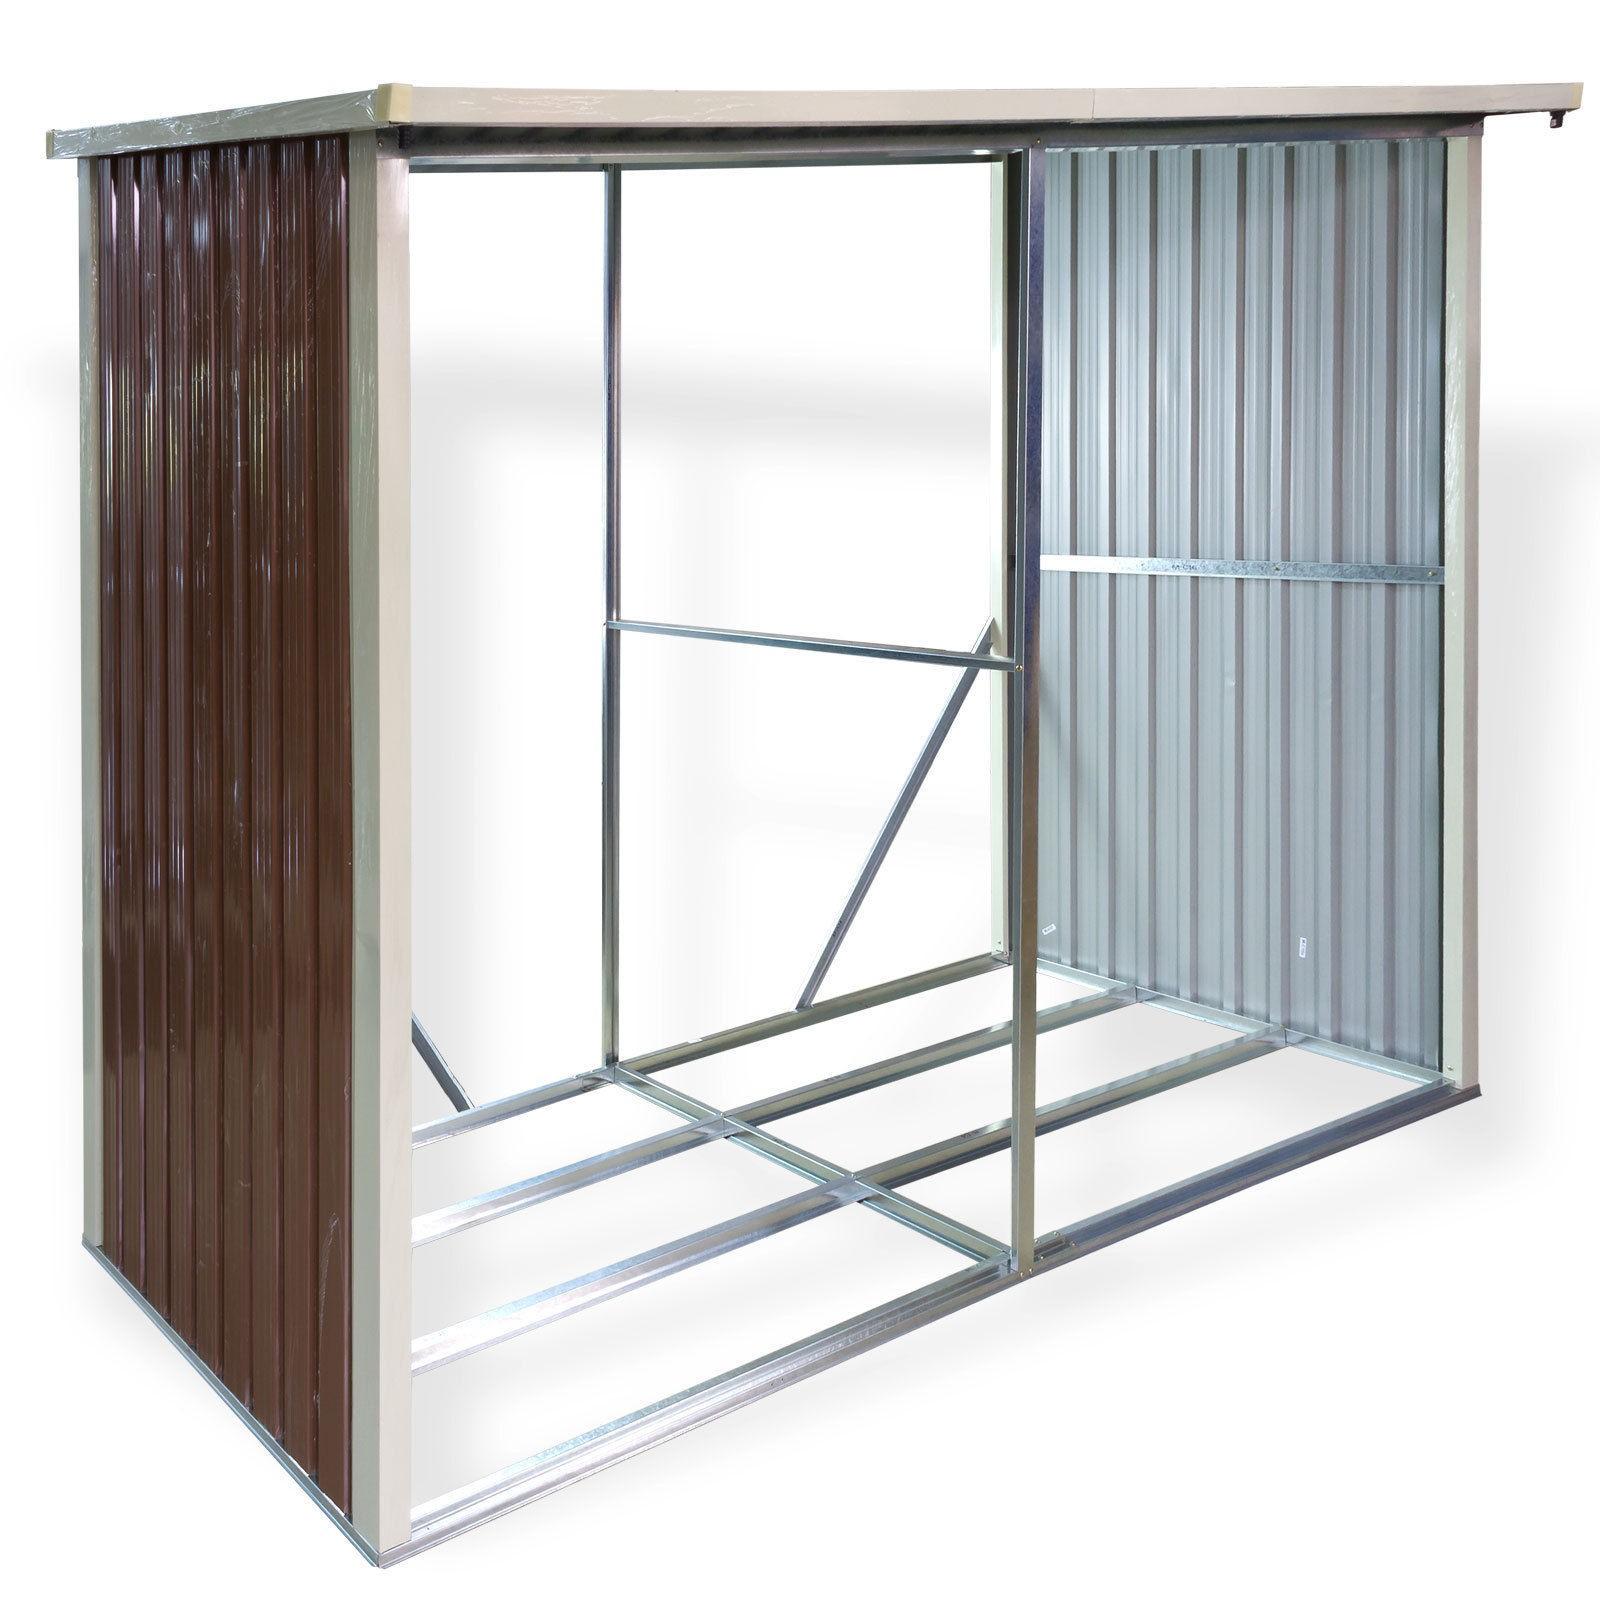 holzregal metall aussen wohn design. Black Bedroom Furniture Sets. Home Design Ideas